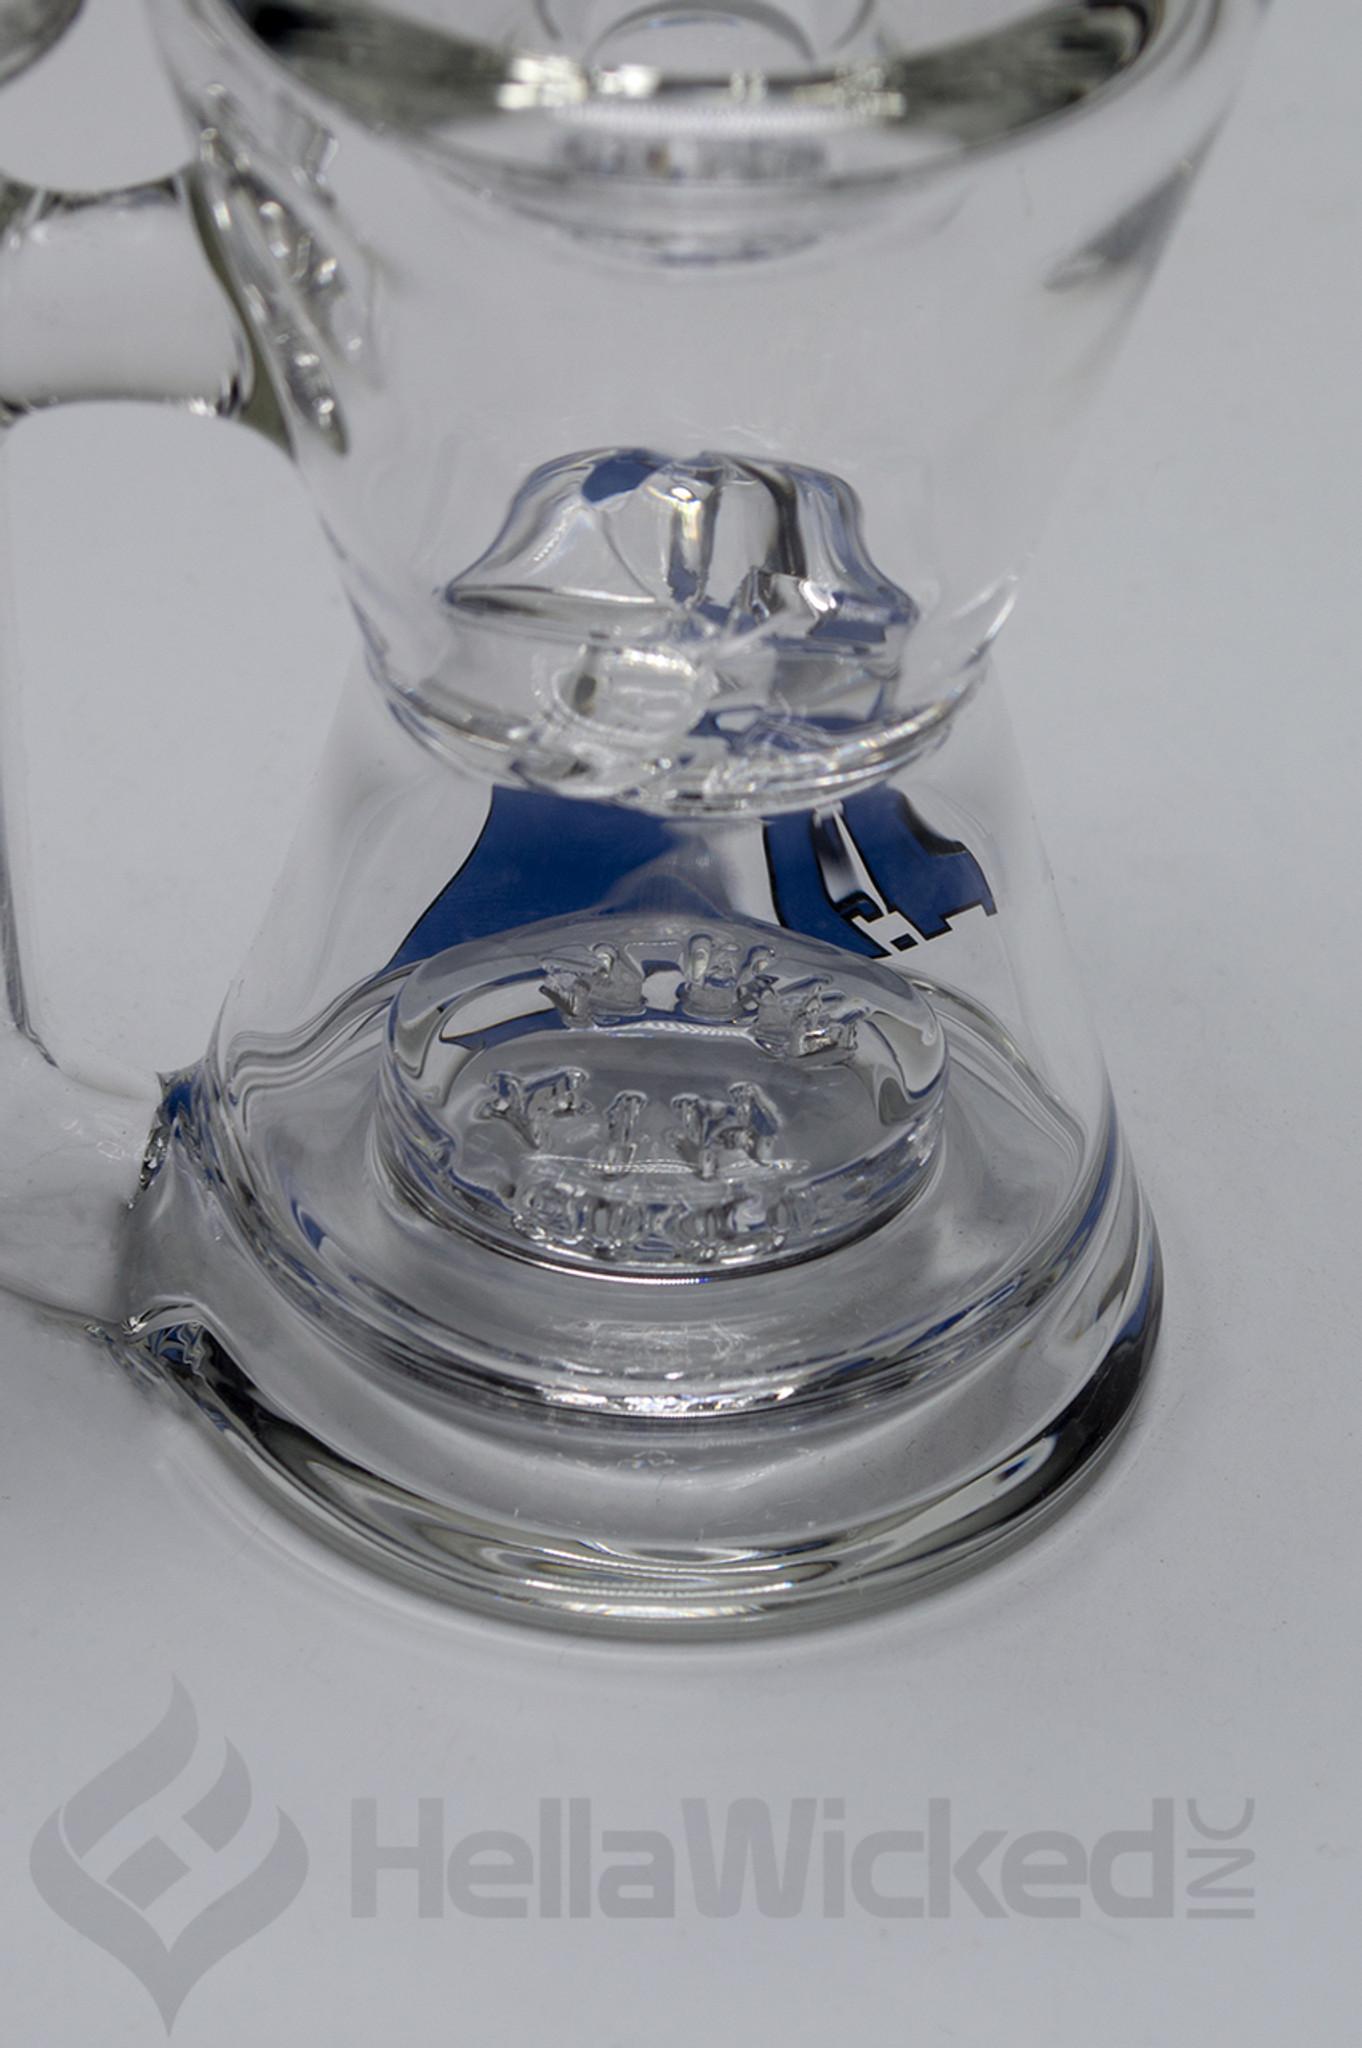 Hitman Glass Mini Turbine Hourglass Rig